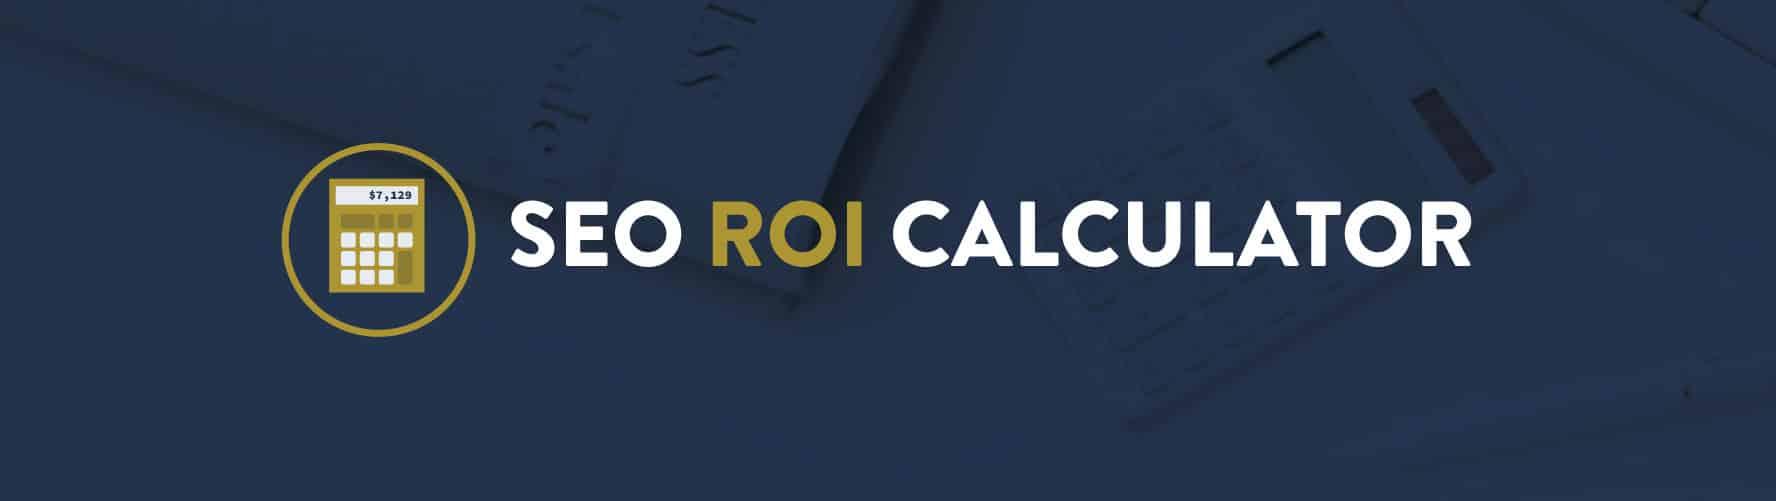 SEO ROI Calculator - Search Engine Optimization Return on Investment